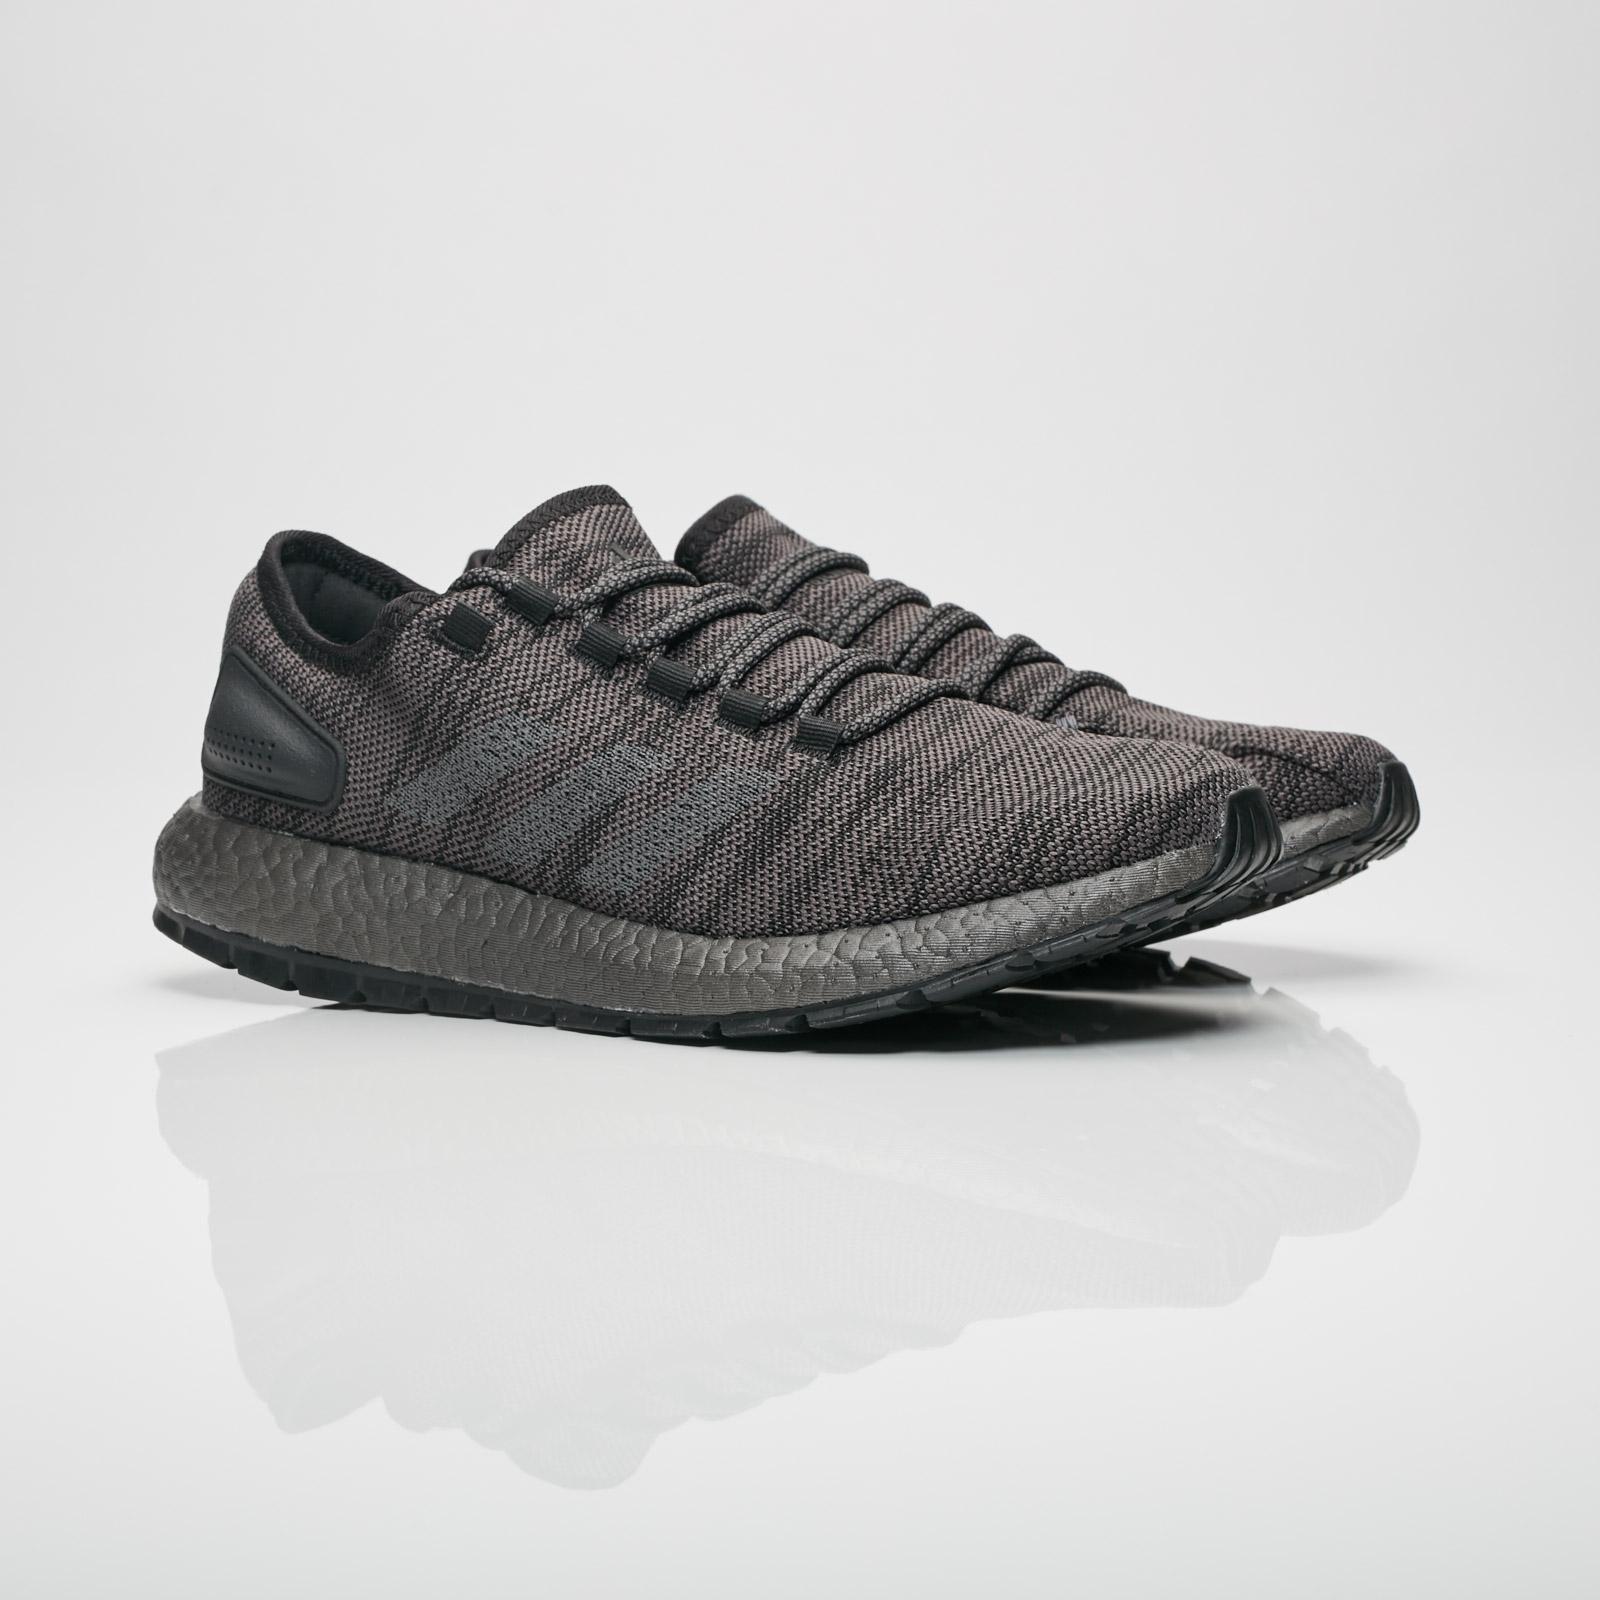 on sale c6535 8d17b adidas Performance Pure Boost All Terrain